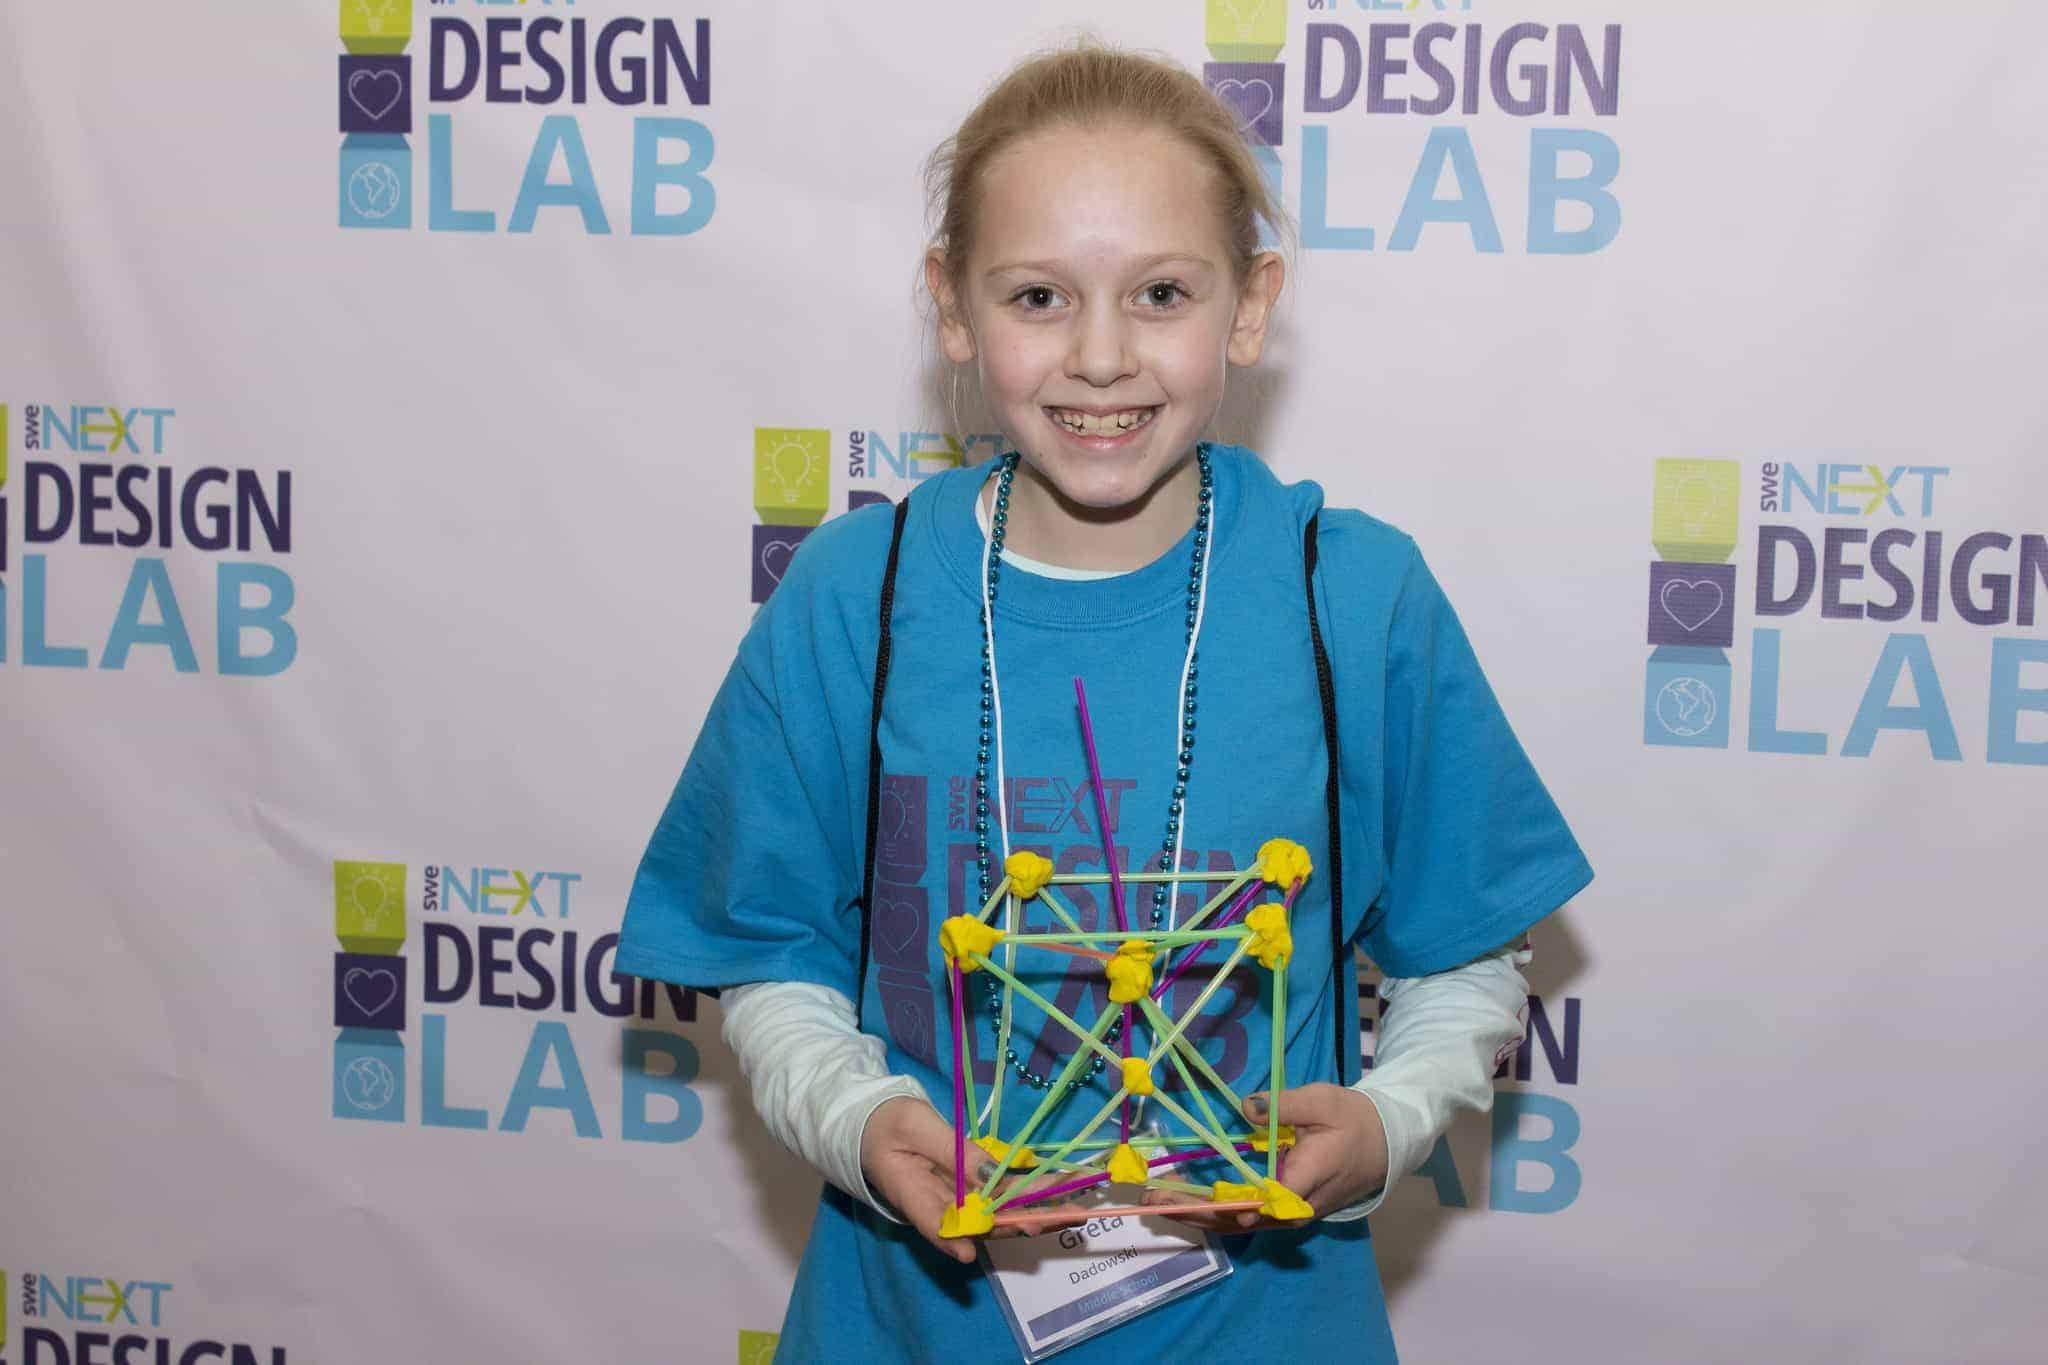 SWENext Design Lab